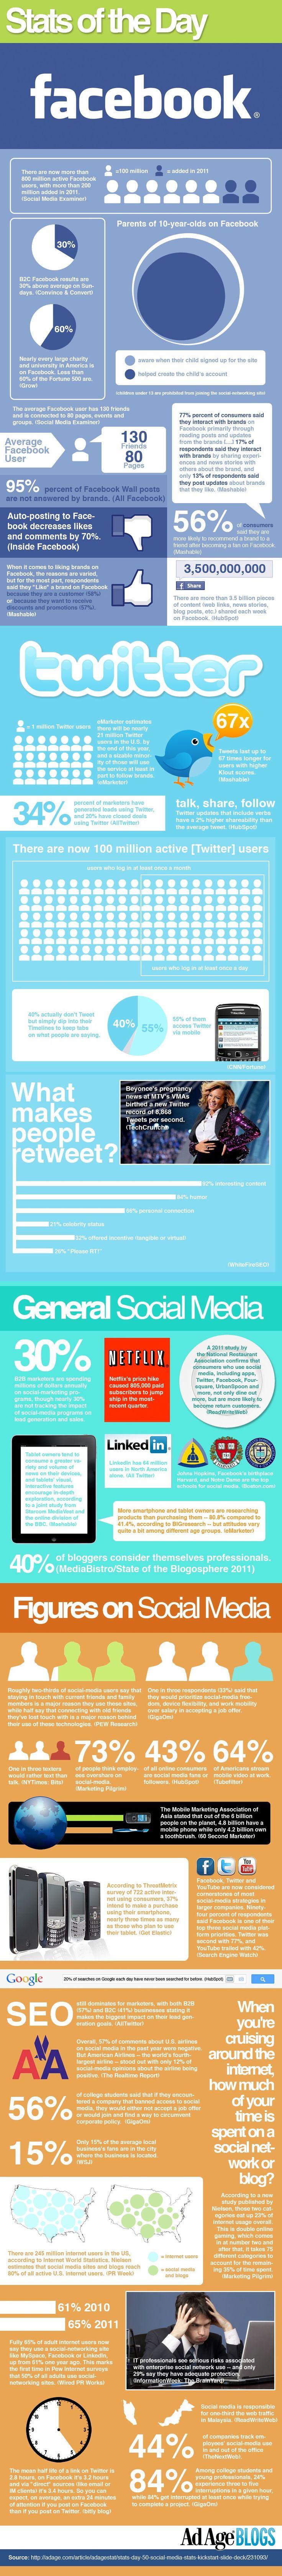 2012 Social Media Infographic